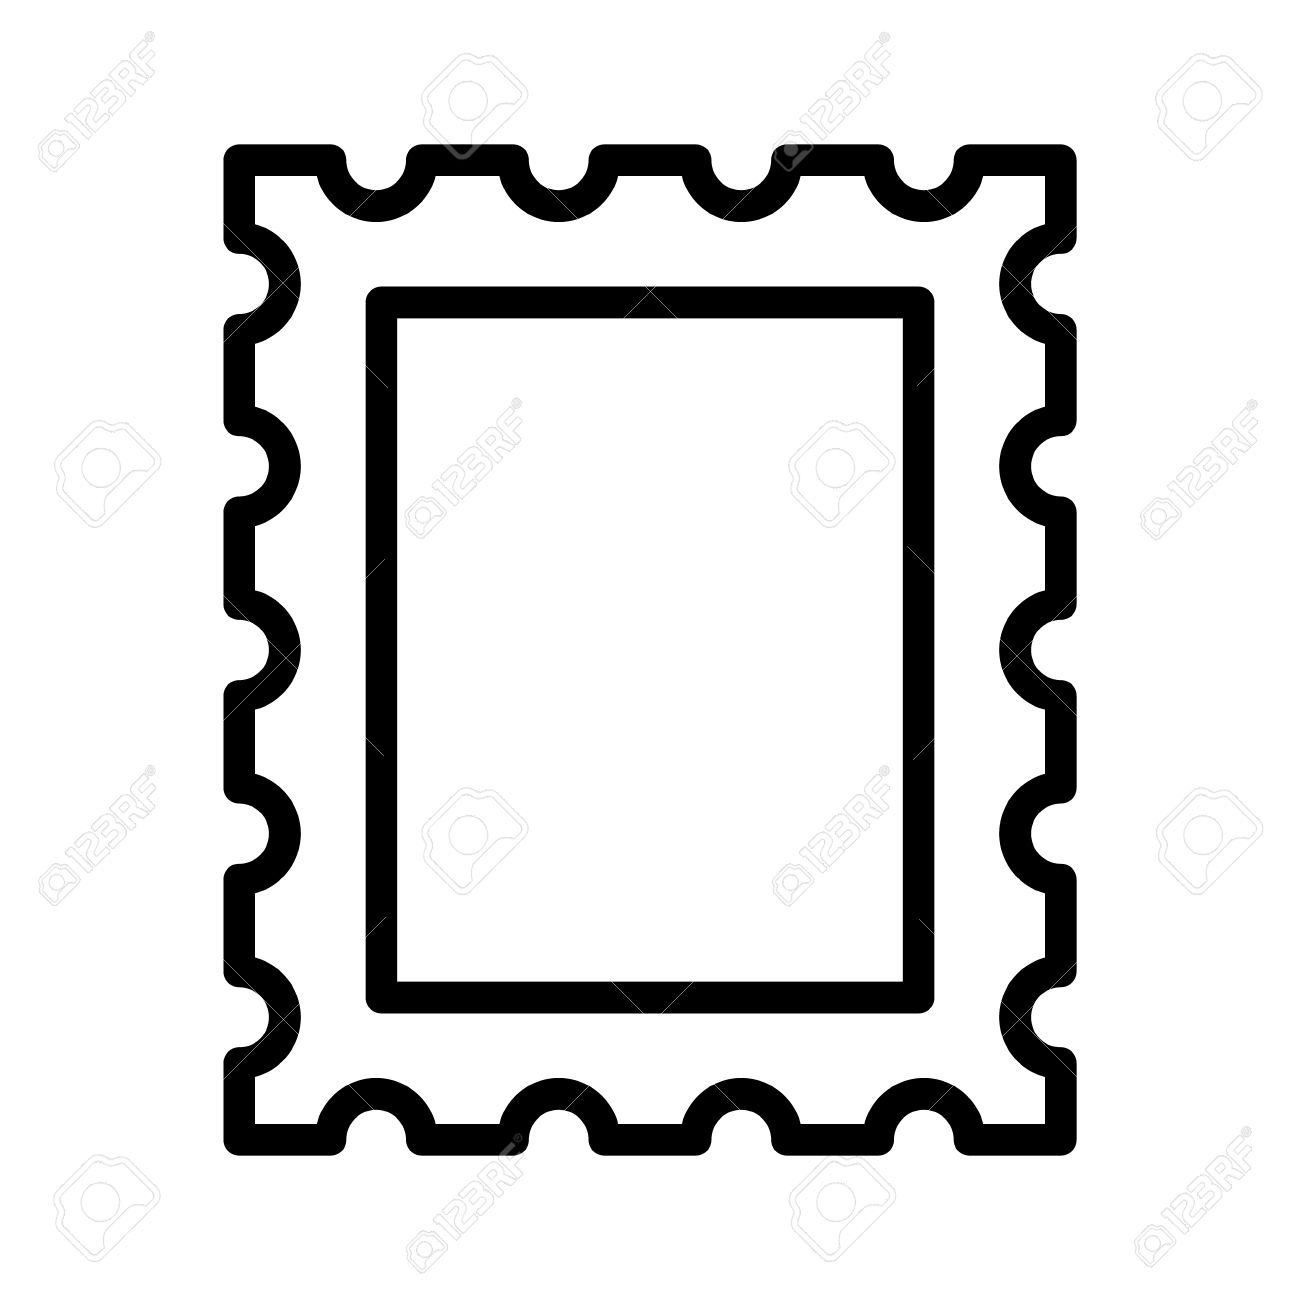 Envelope clipart postal letter. Mail cliparts free download